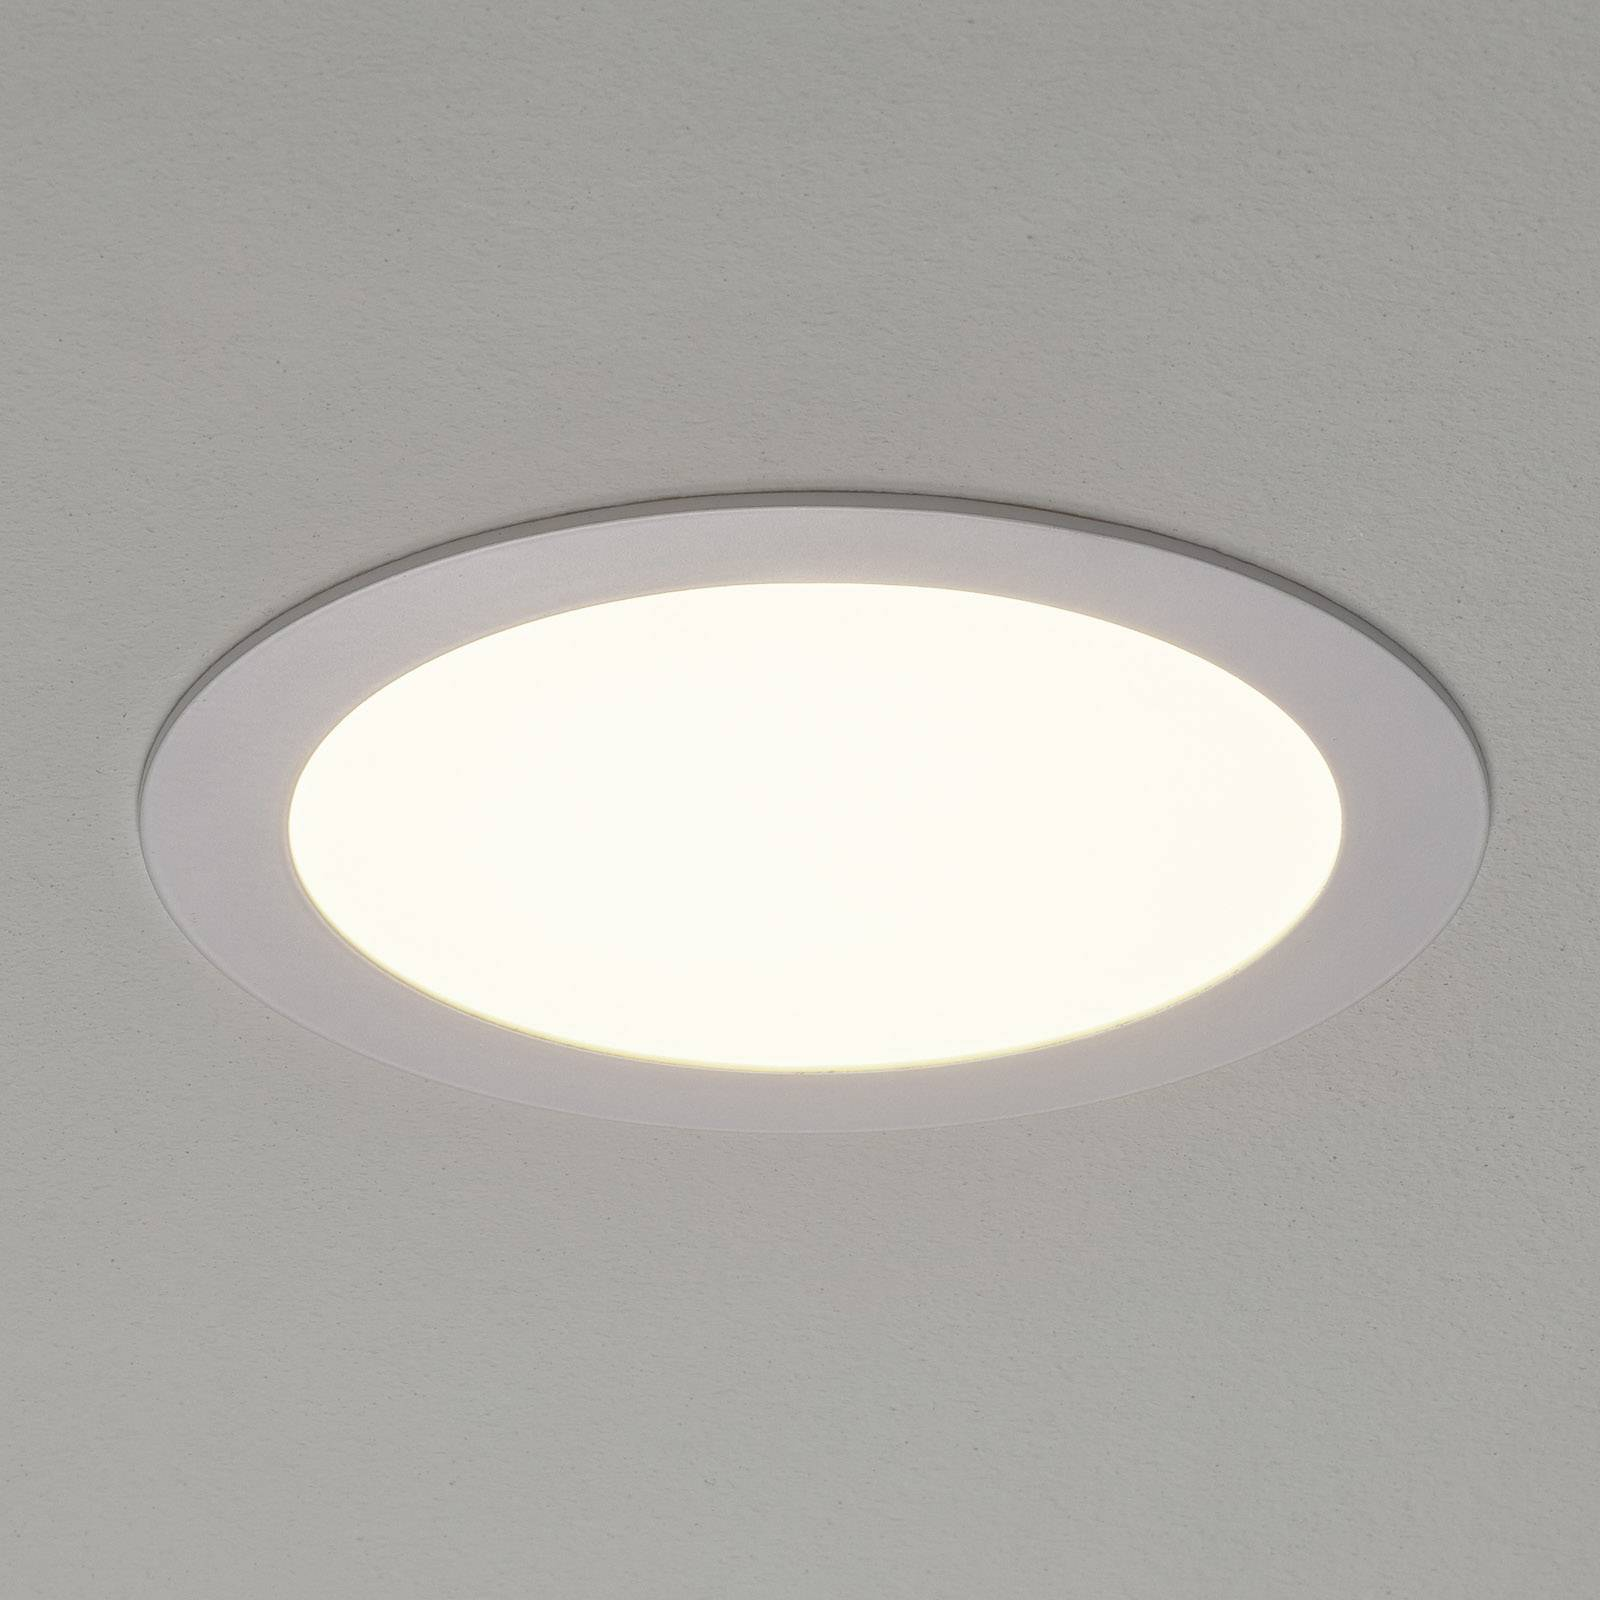 Valkoinen Fueva-Connect -LED-uppovalaisin 22,5 cm